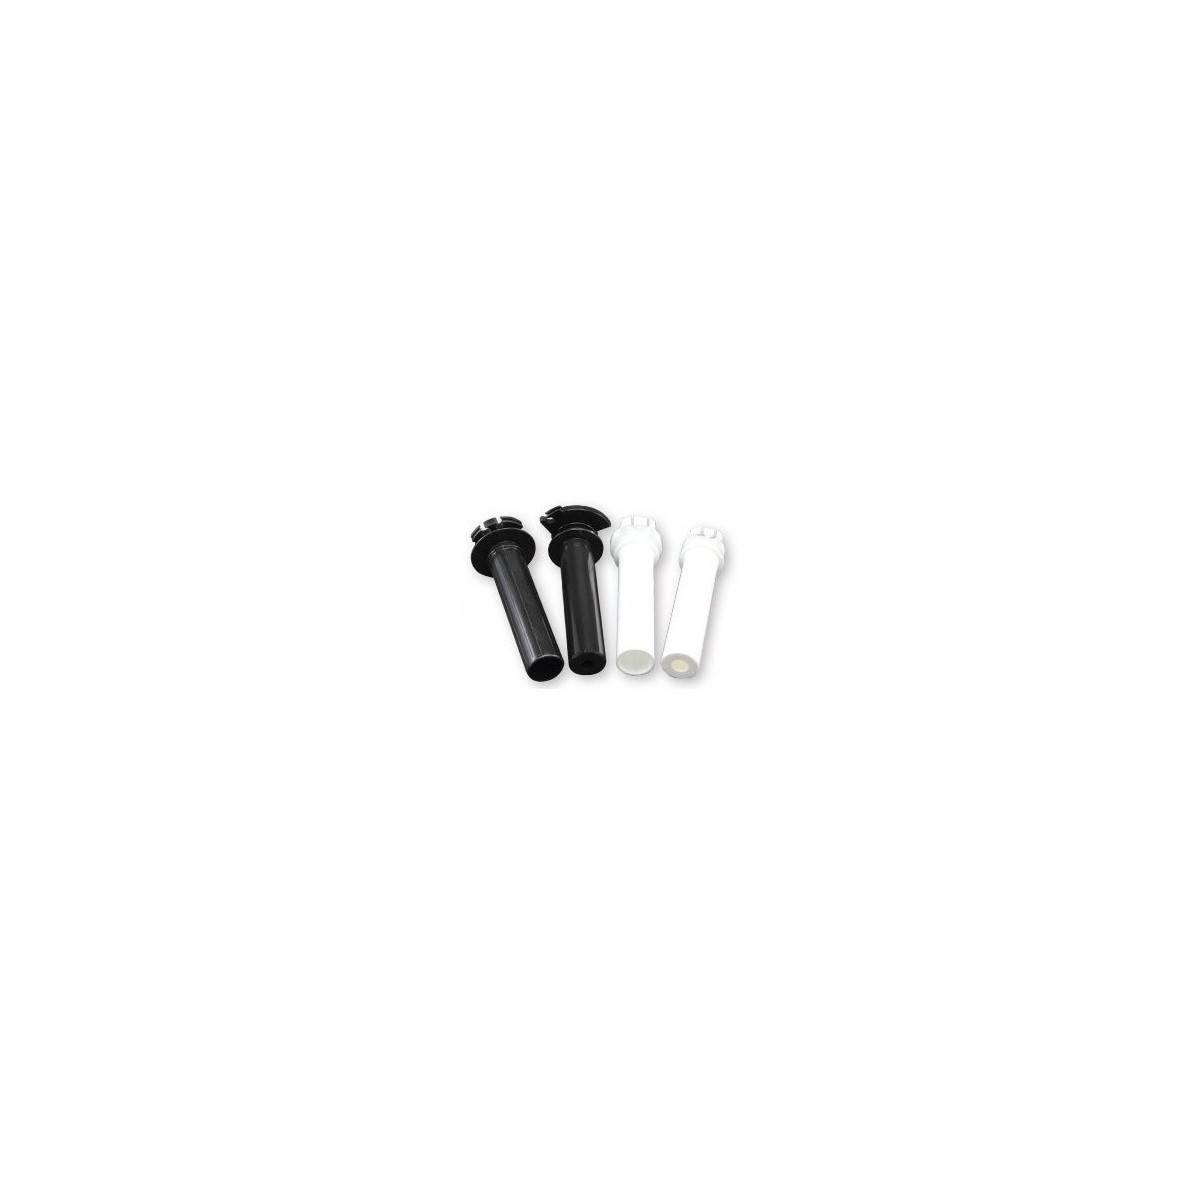 ZE45.8004 - Caña Gas Plastico Kx 65 85 Universal